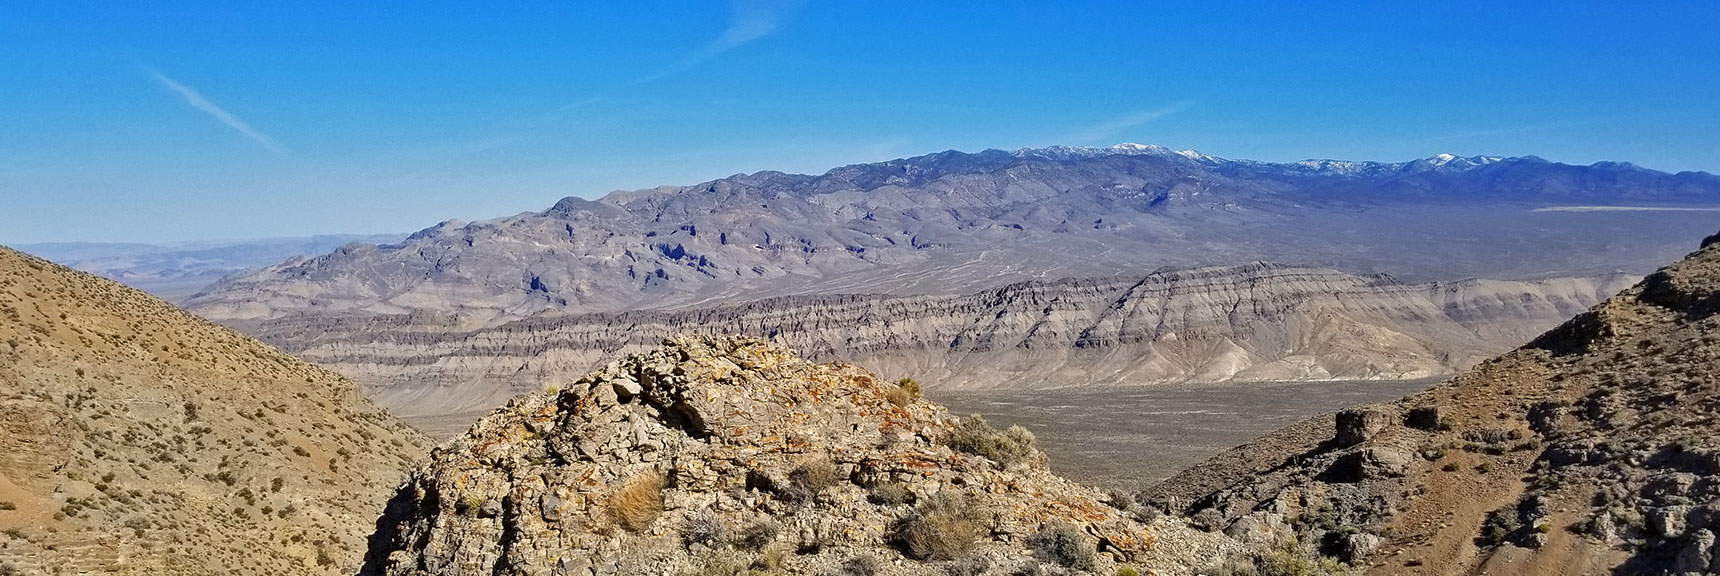 View Down the Mid-Summit Ridge Northern Canyon Toward the Sheep Range | Gass Peak Eastern Summit Ultra-marathon Adventure, Nevada